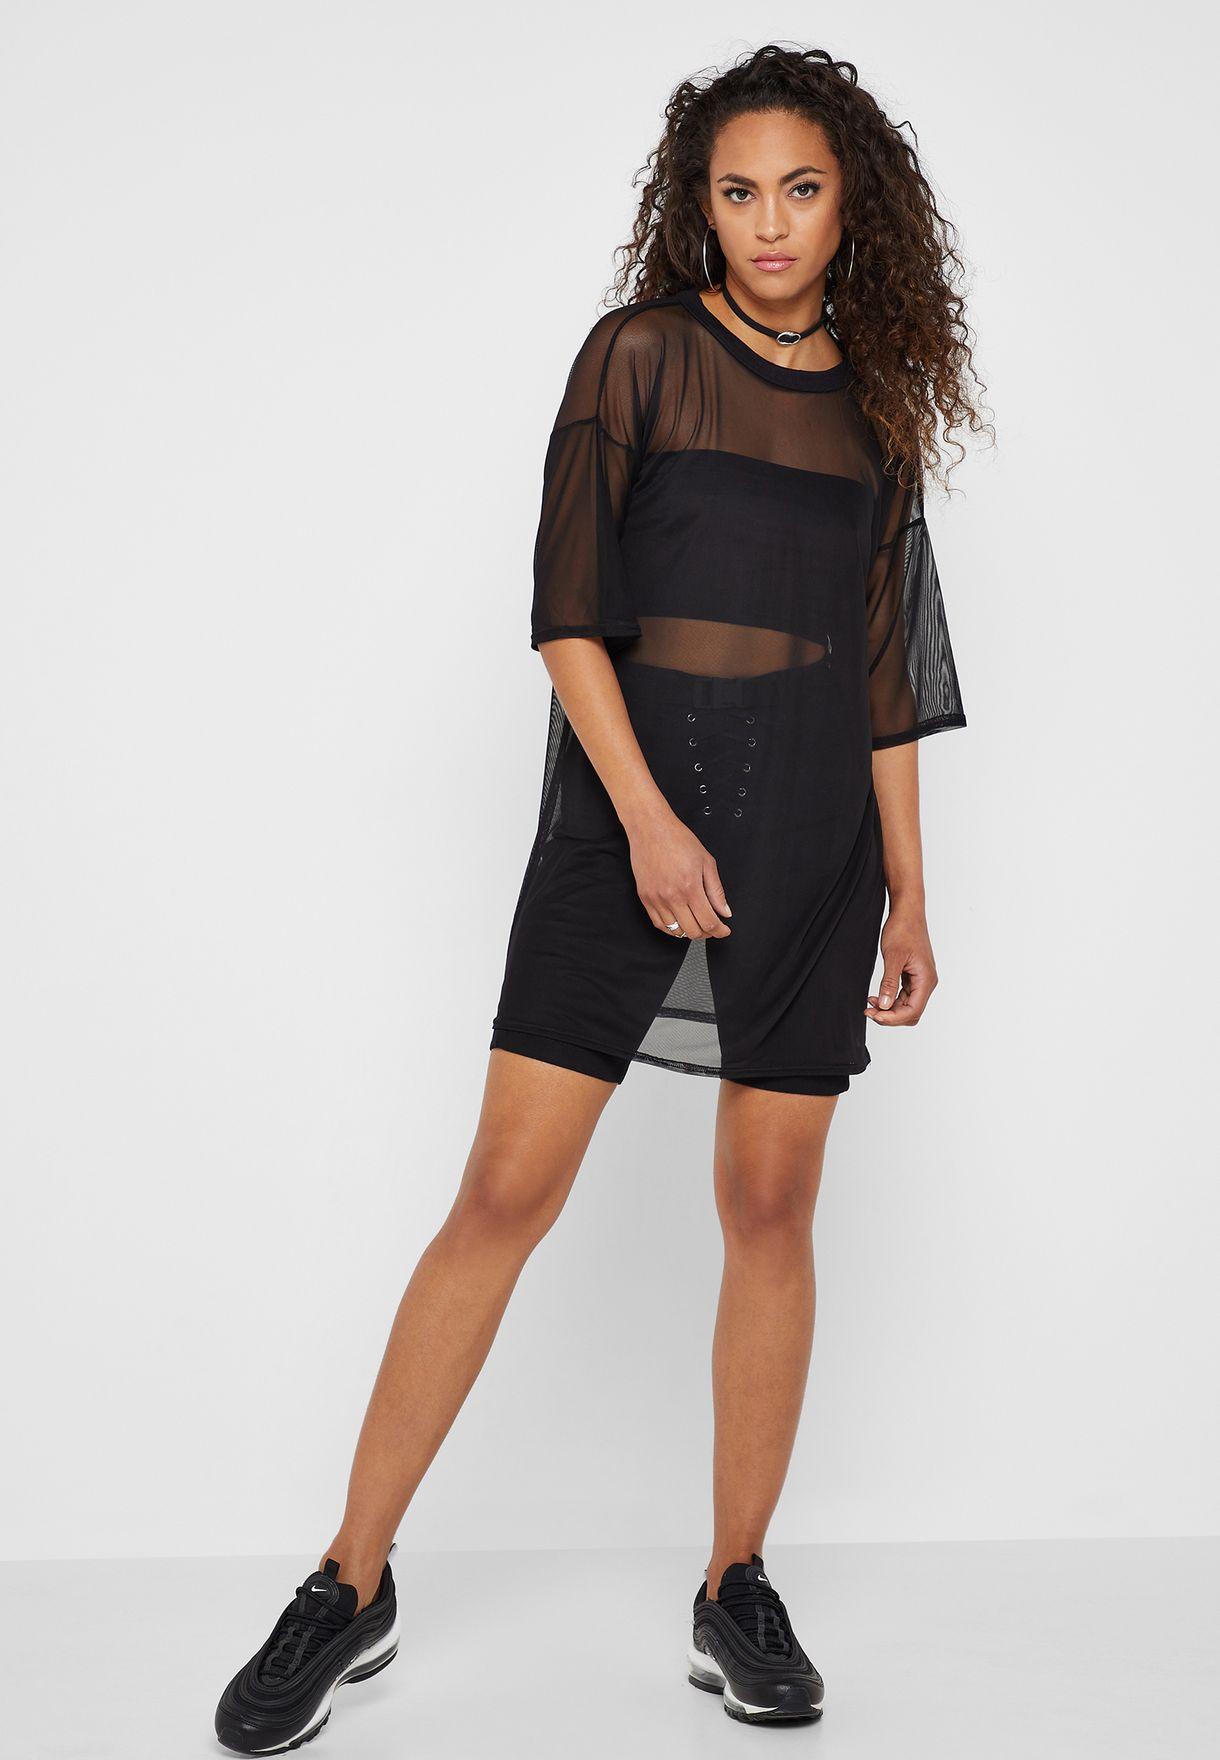 cf0f5257e Shop Missguided black Oversize Mesh T-Shirt Dress DD917704 for Women ...